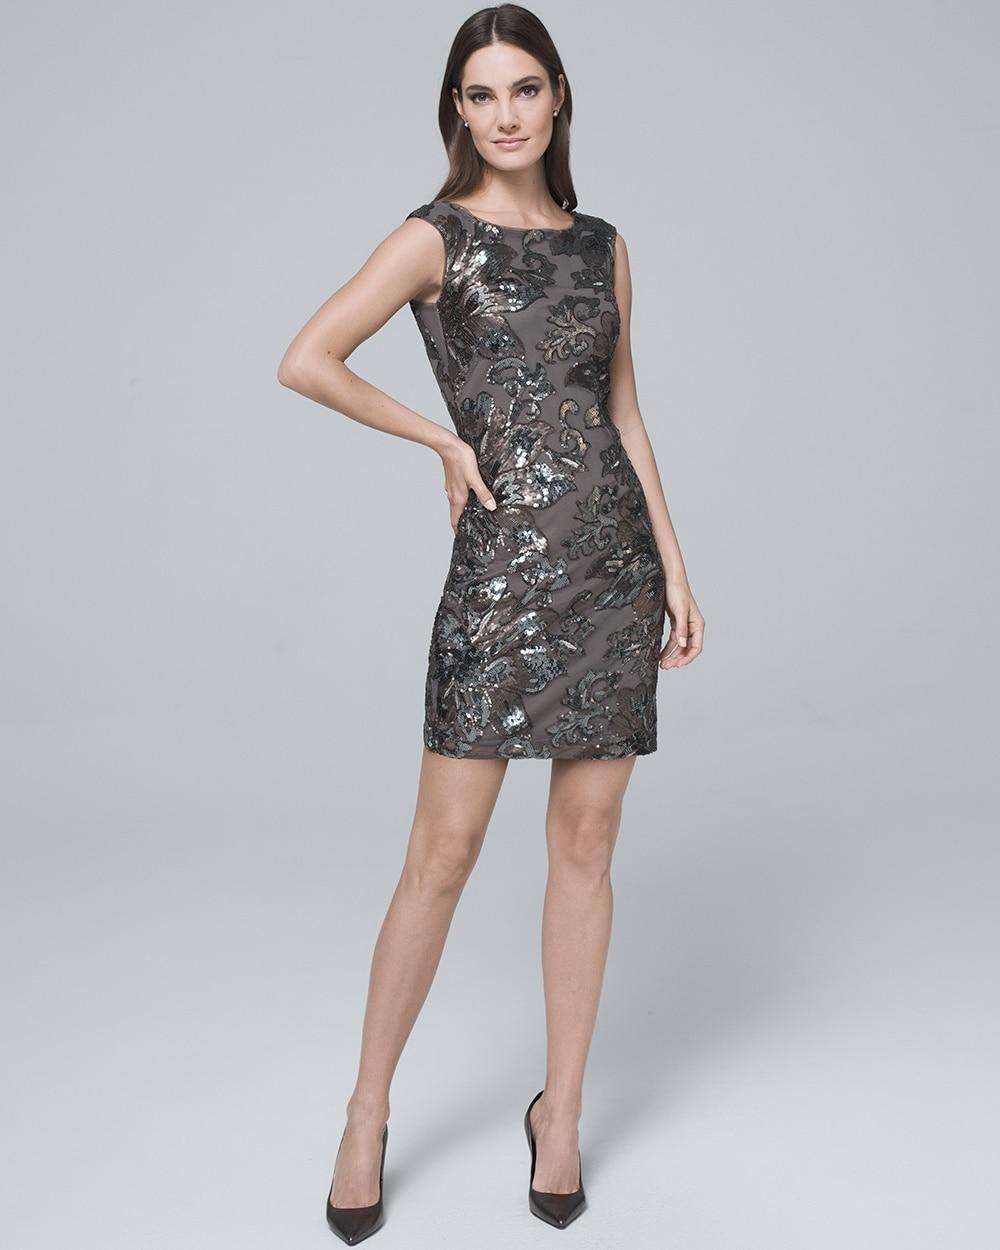 e87cdfc22c7 Sequin-Detail Shift Dress - White House Black Market